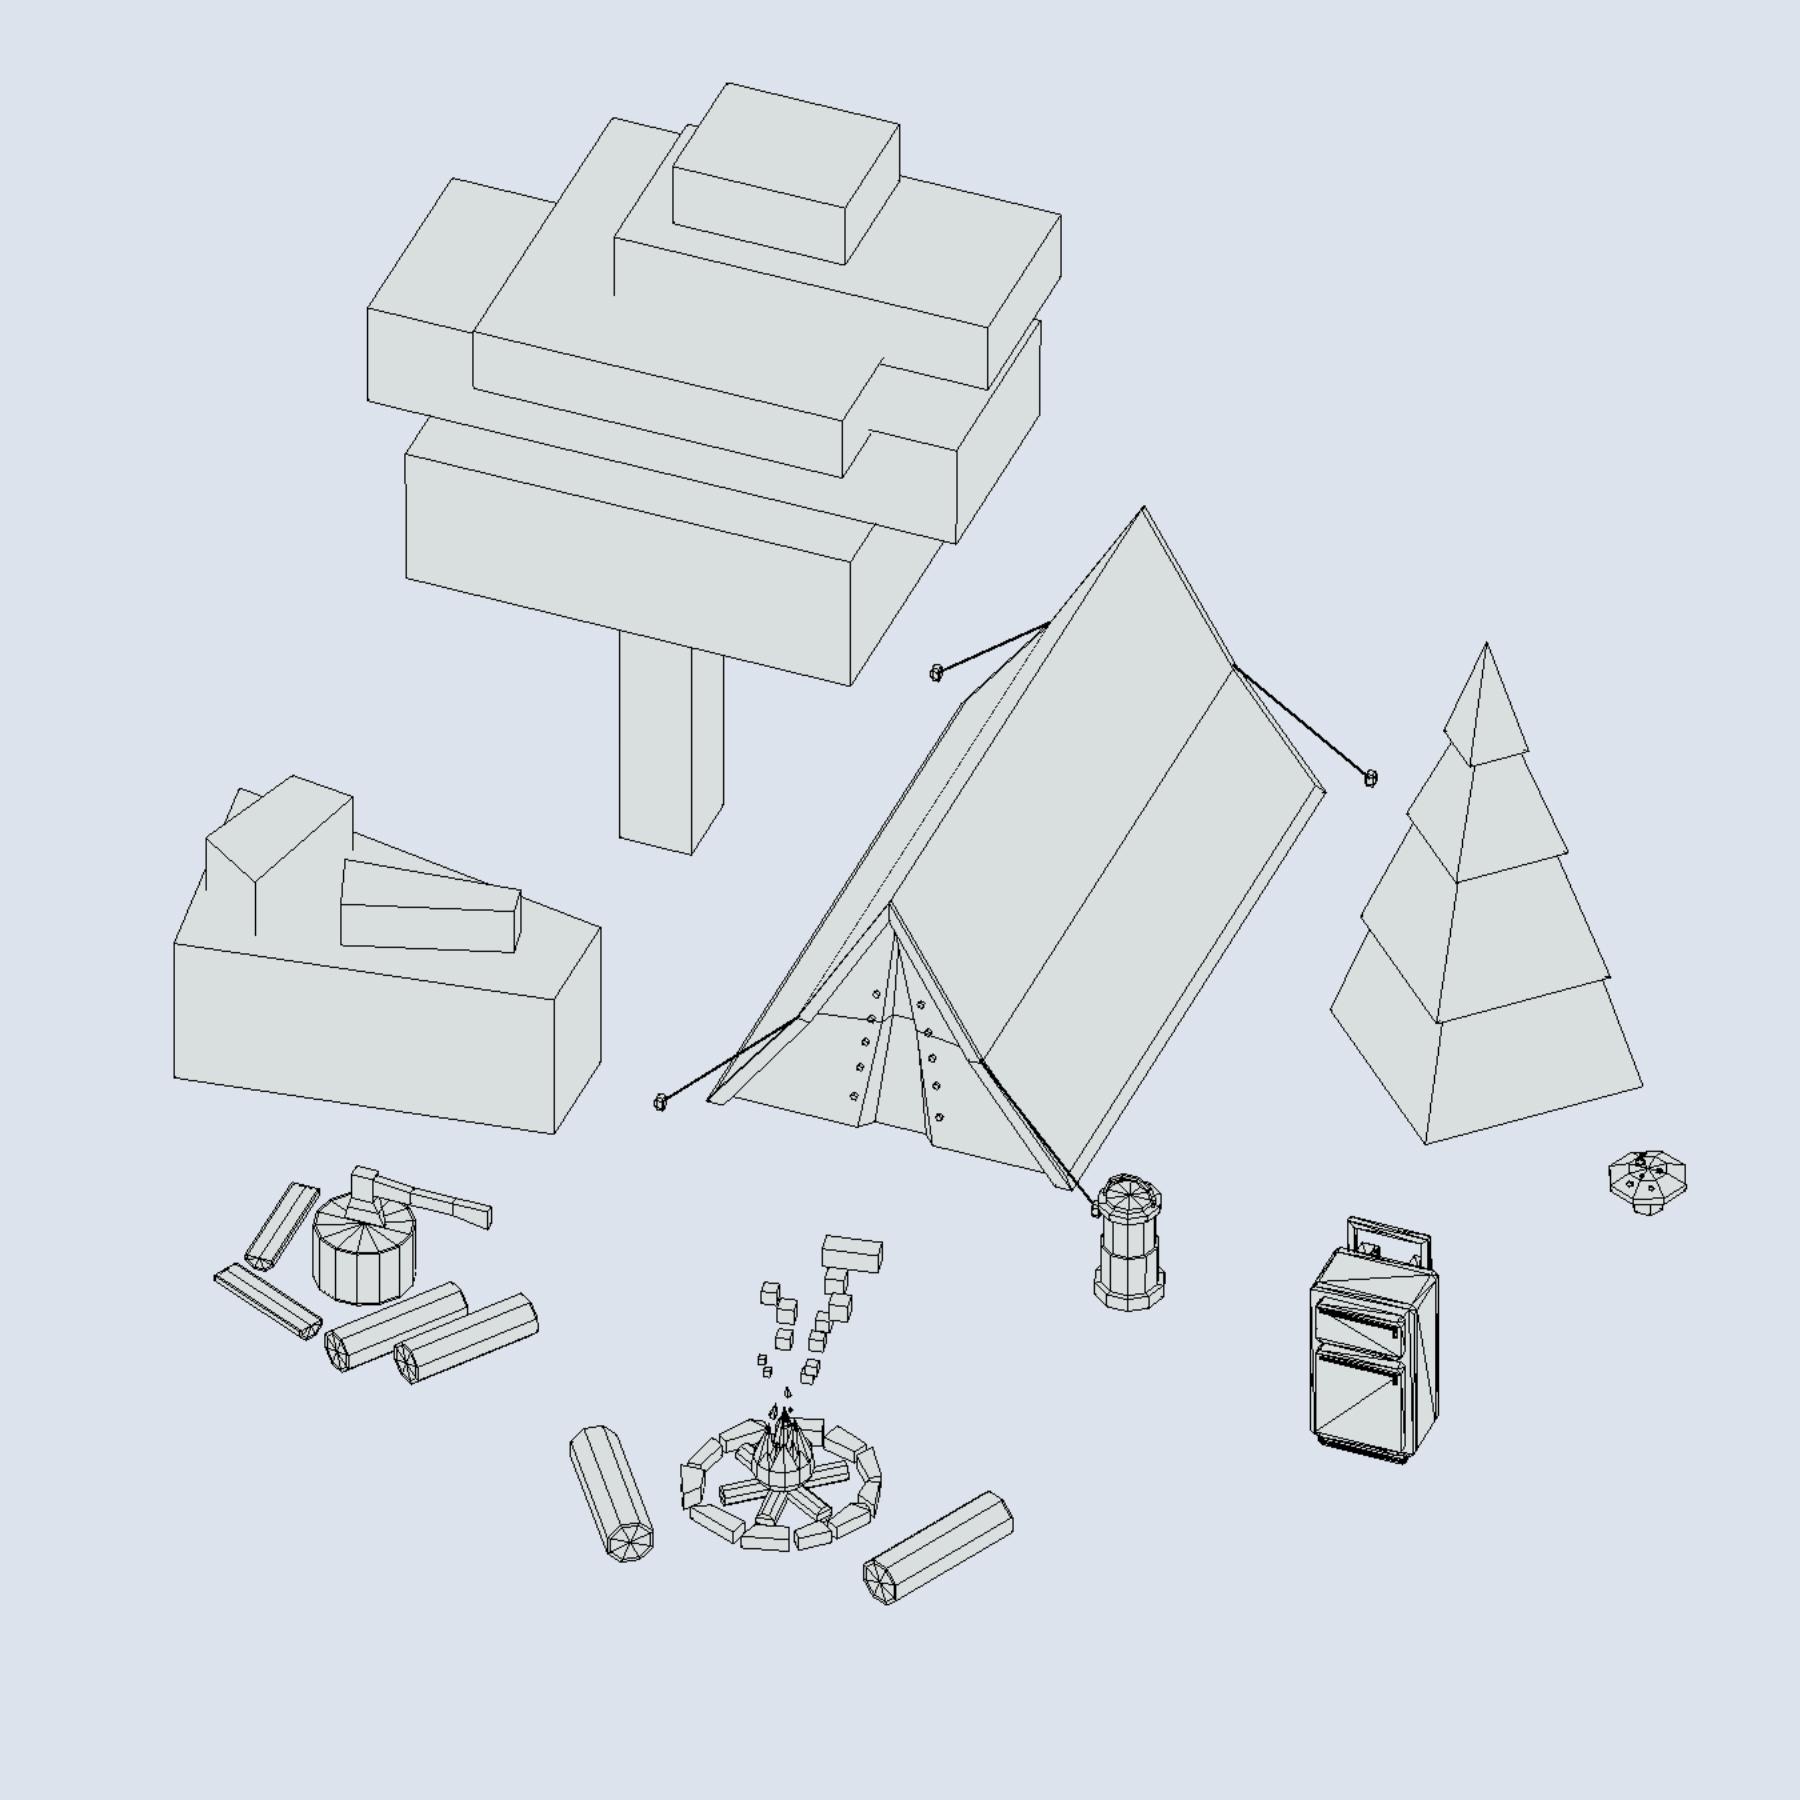 objects tourism cooking bbq tent fire ax 3d model 3ds max fbx ma mb png obj 271074